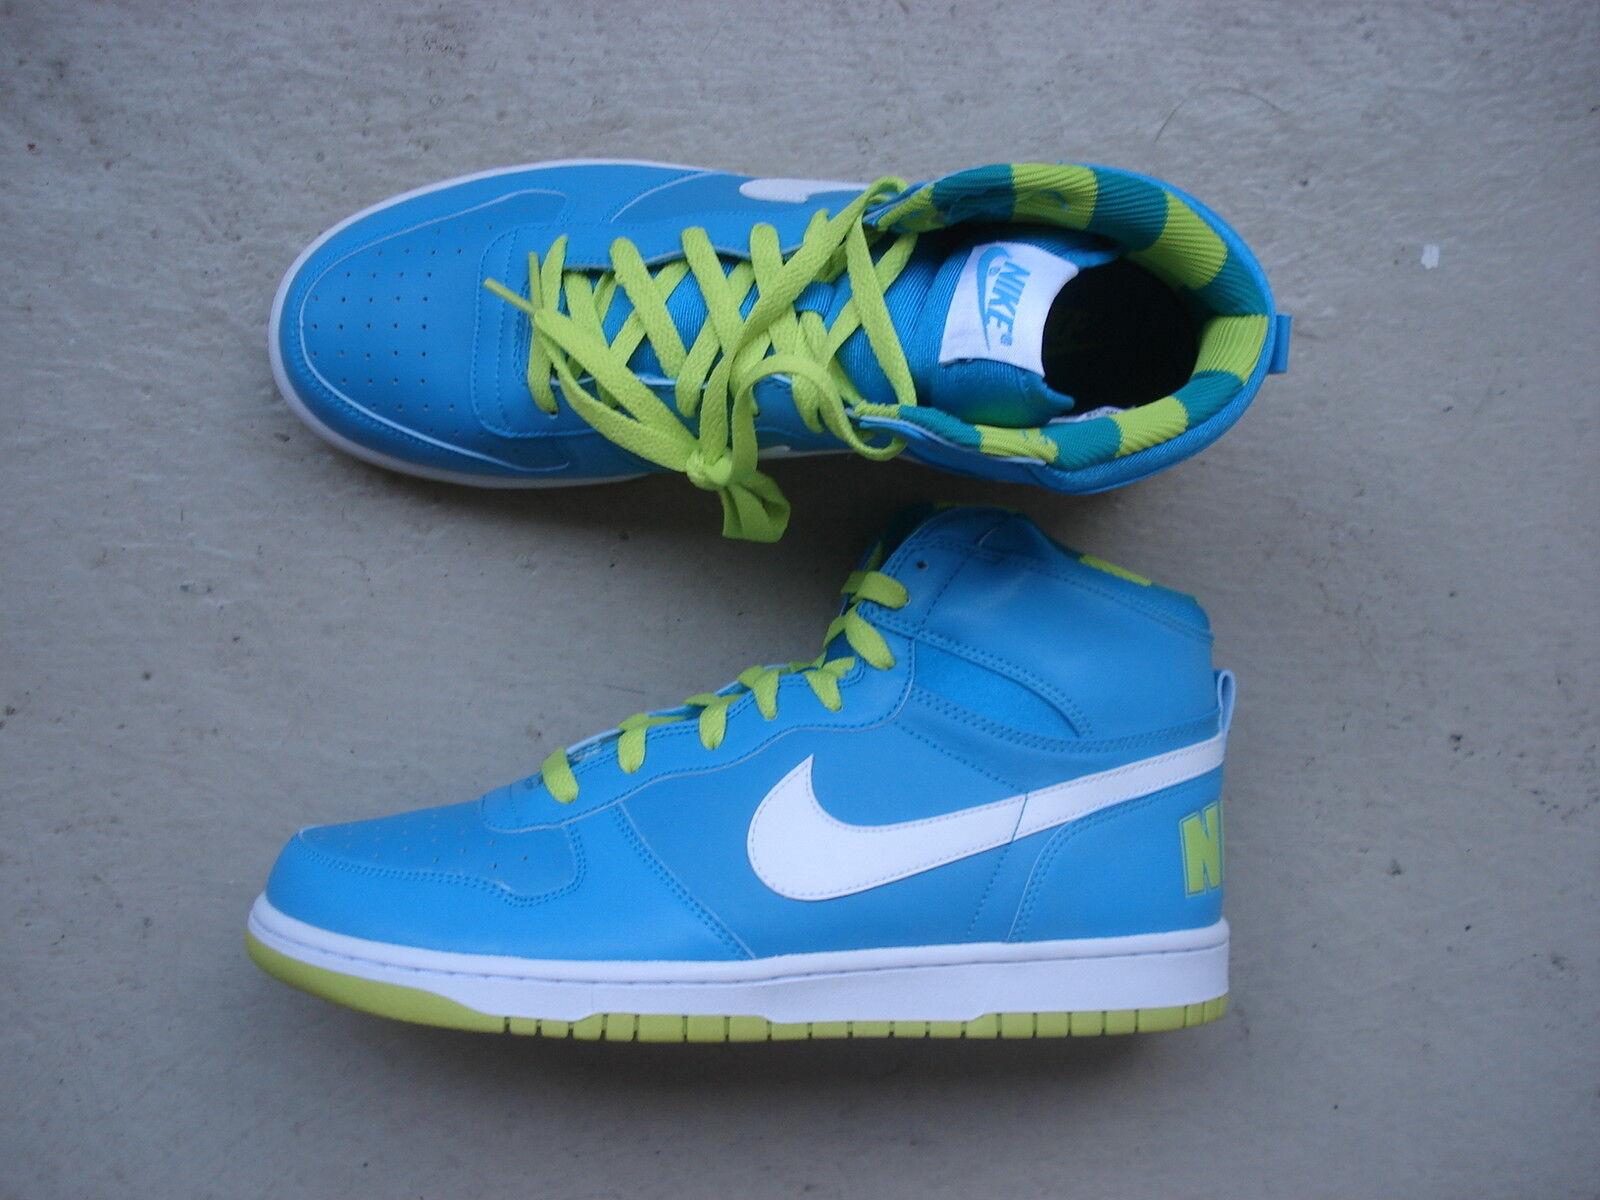 Nike Air Big High 45 Turquoise/LIme Green